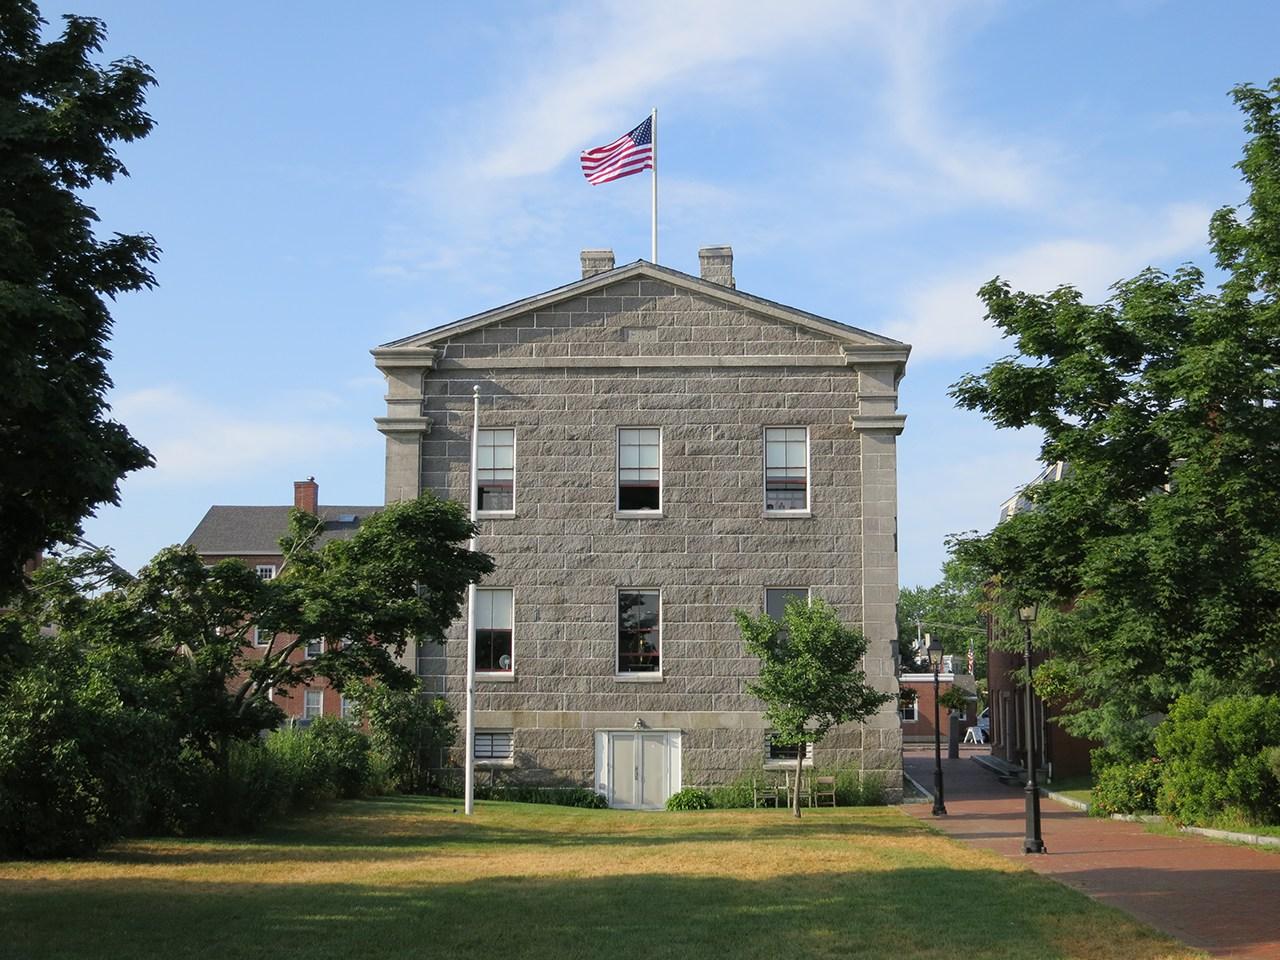 Custom House Maritime Museum, Newburyport, MA